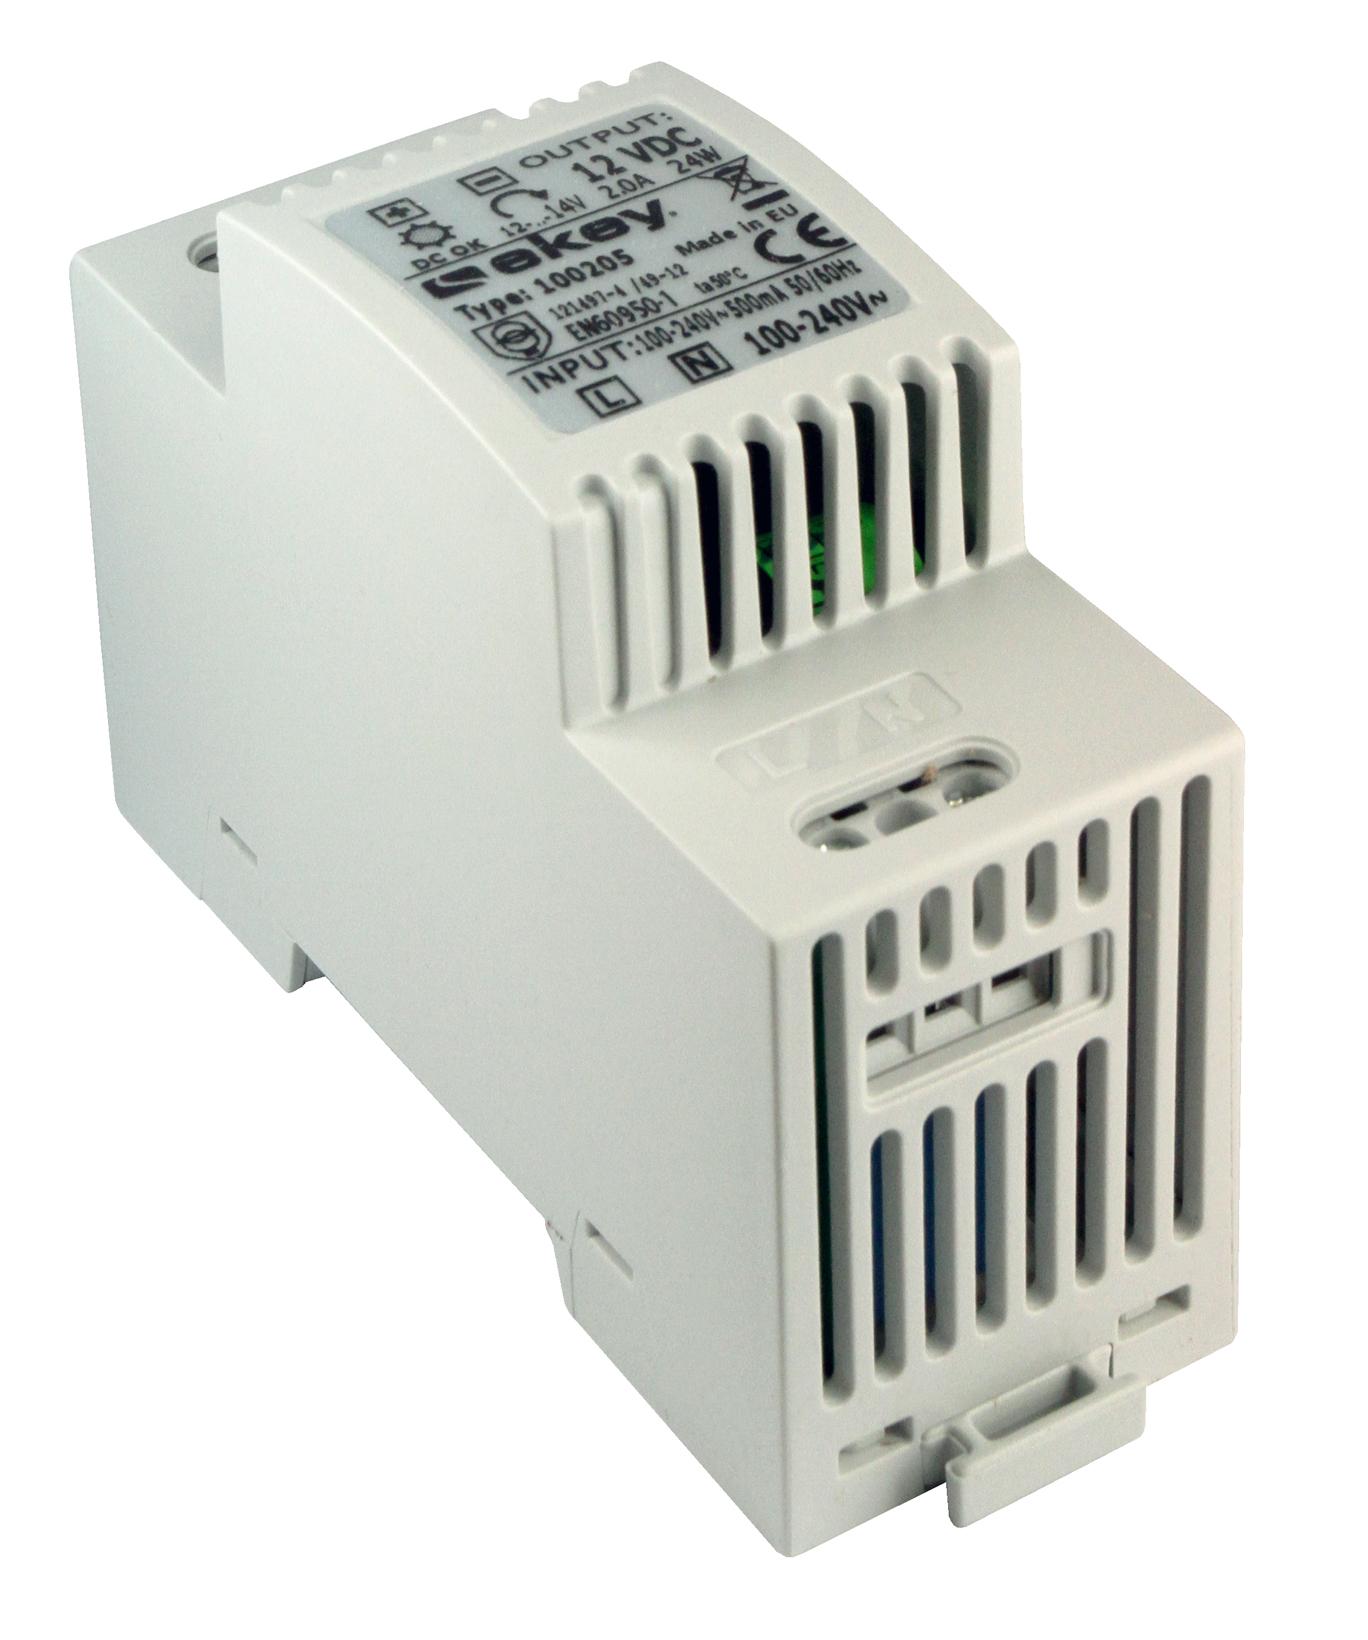 1 Stk Netzteil Ausgang: 12VDC, Leistung: 2A, Reiheneinbau 3 TE EK100205--